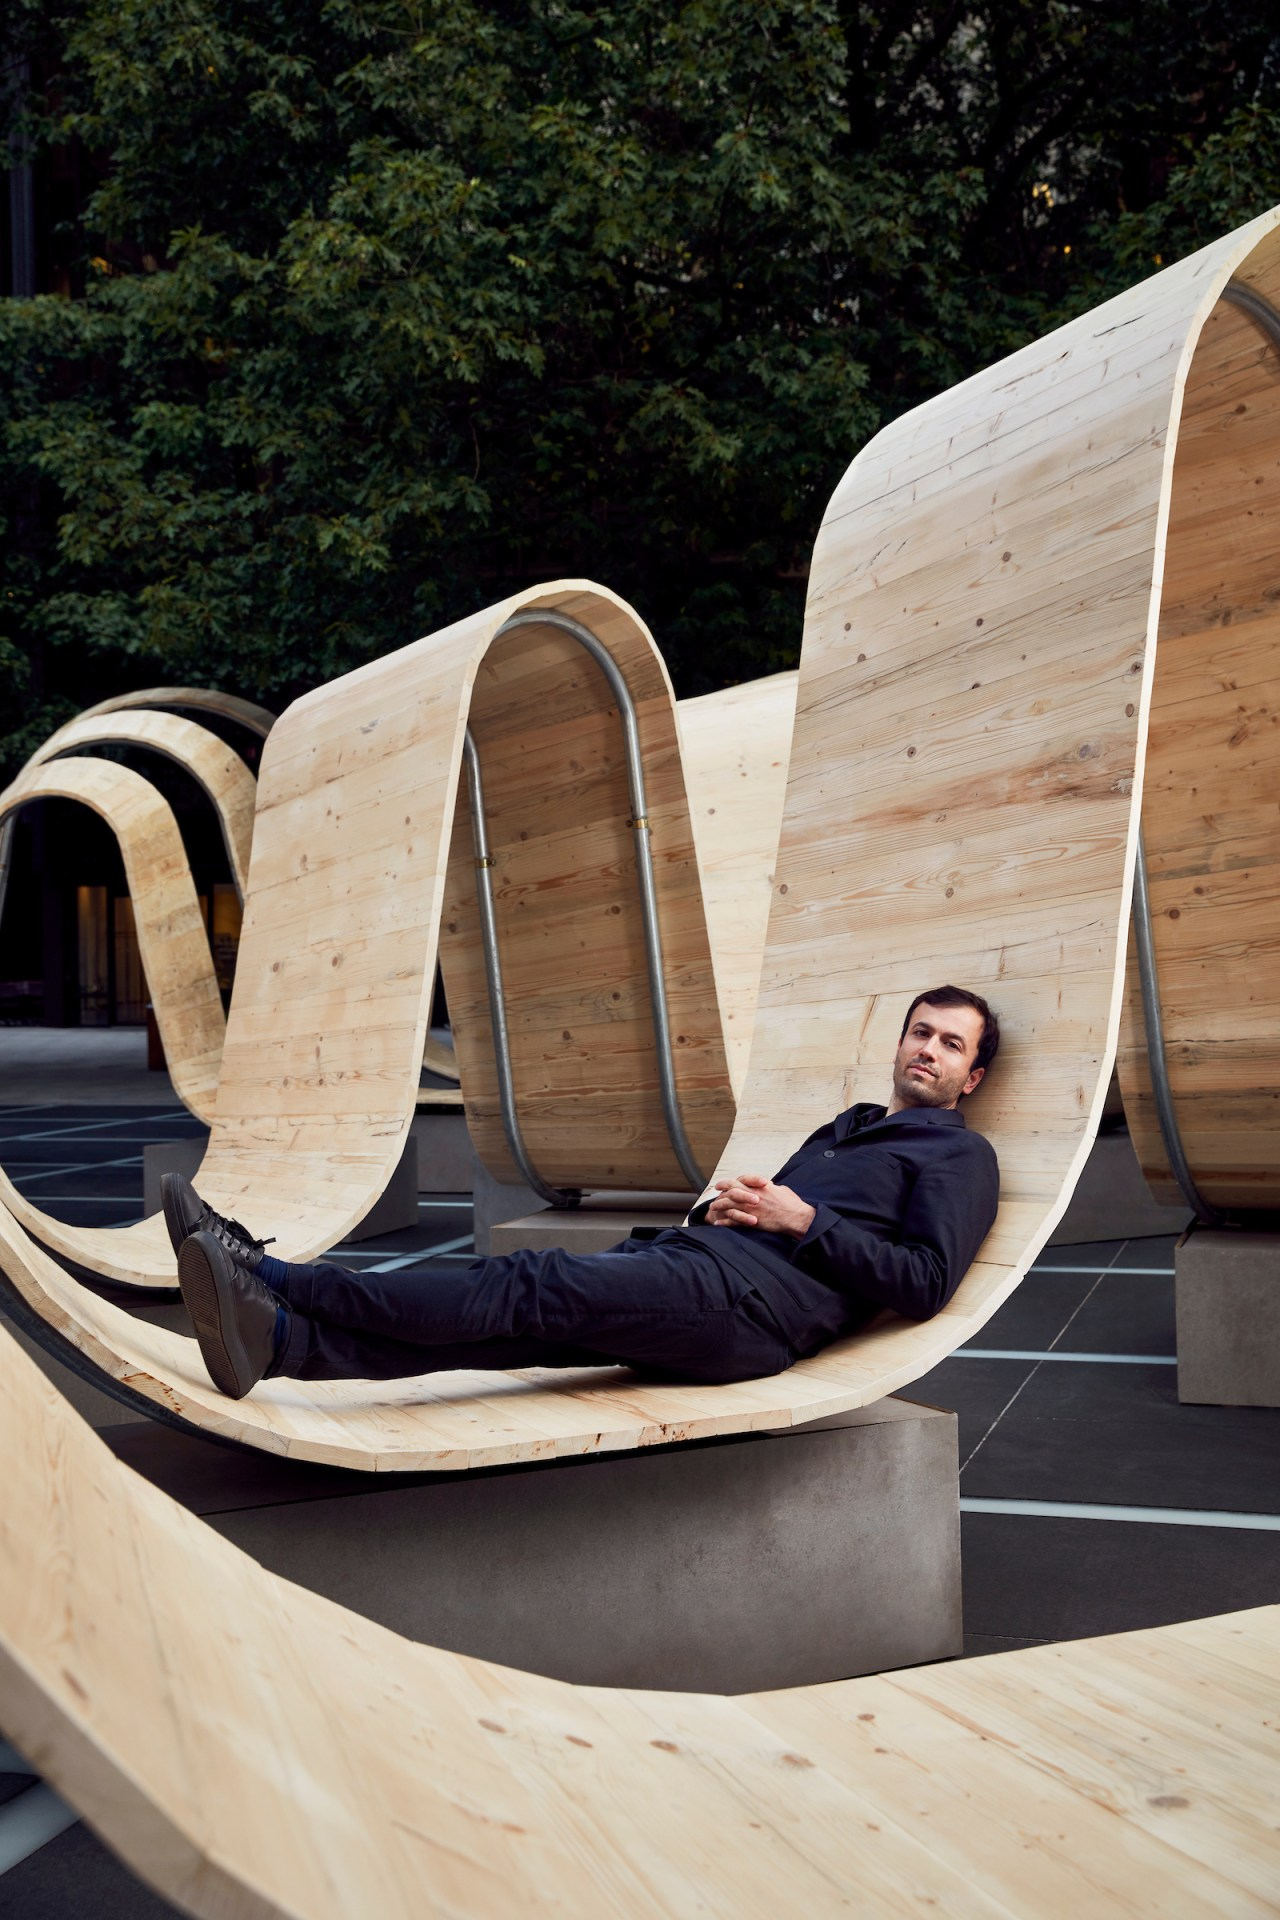 Designer Paul Cocksedge picks his own spot to architecture, furniture, leisure, sitting, tree, wood, black, gray